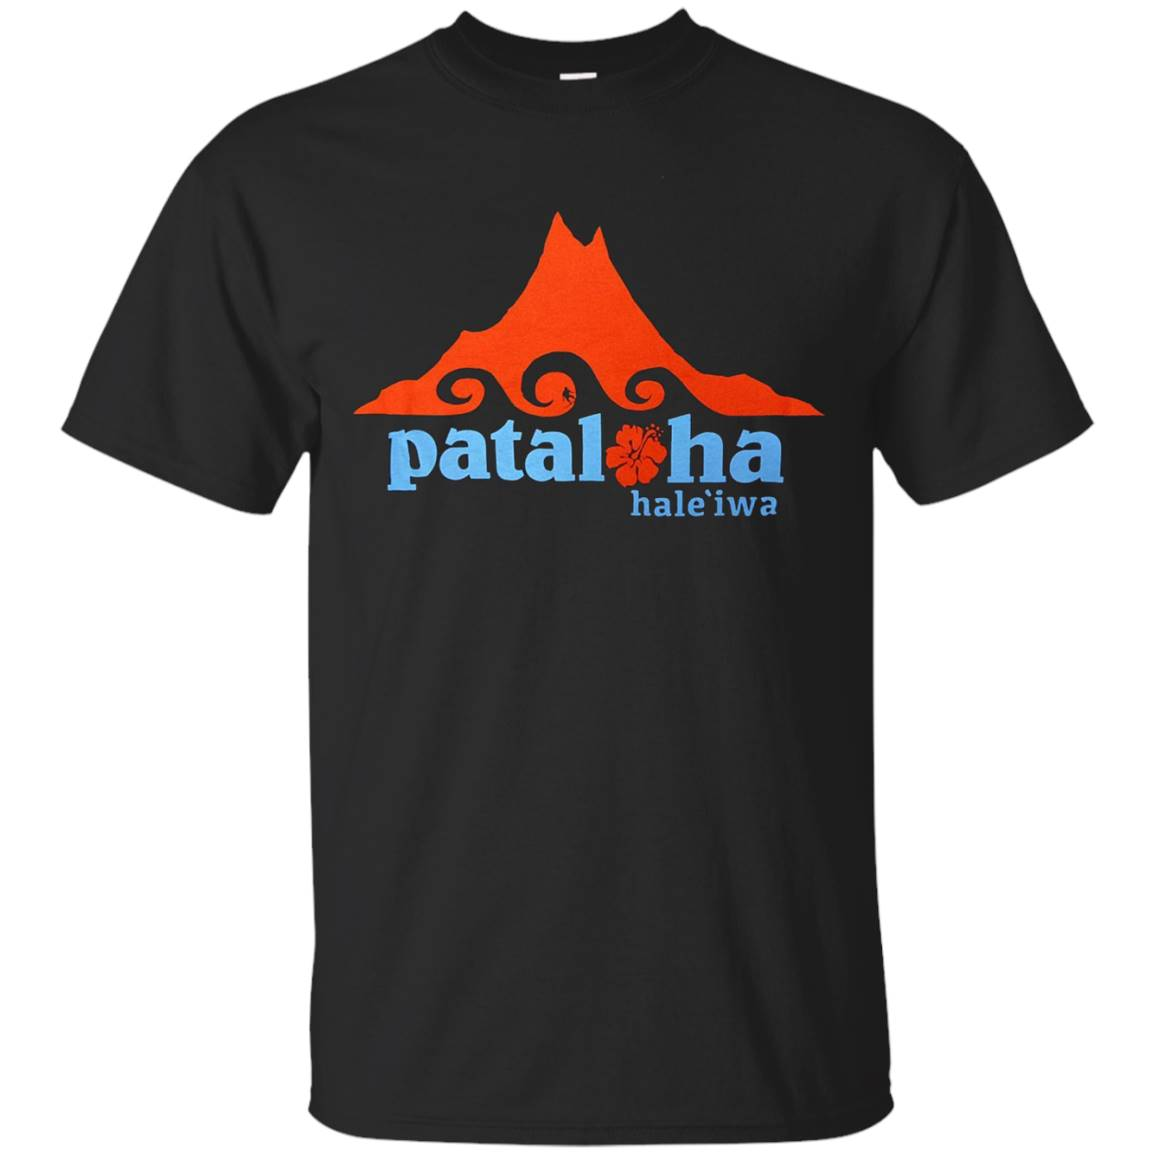 Patagonia Pataloha Illustrated T Shirt Funny Gifts